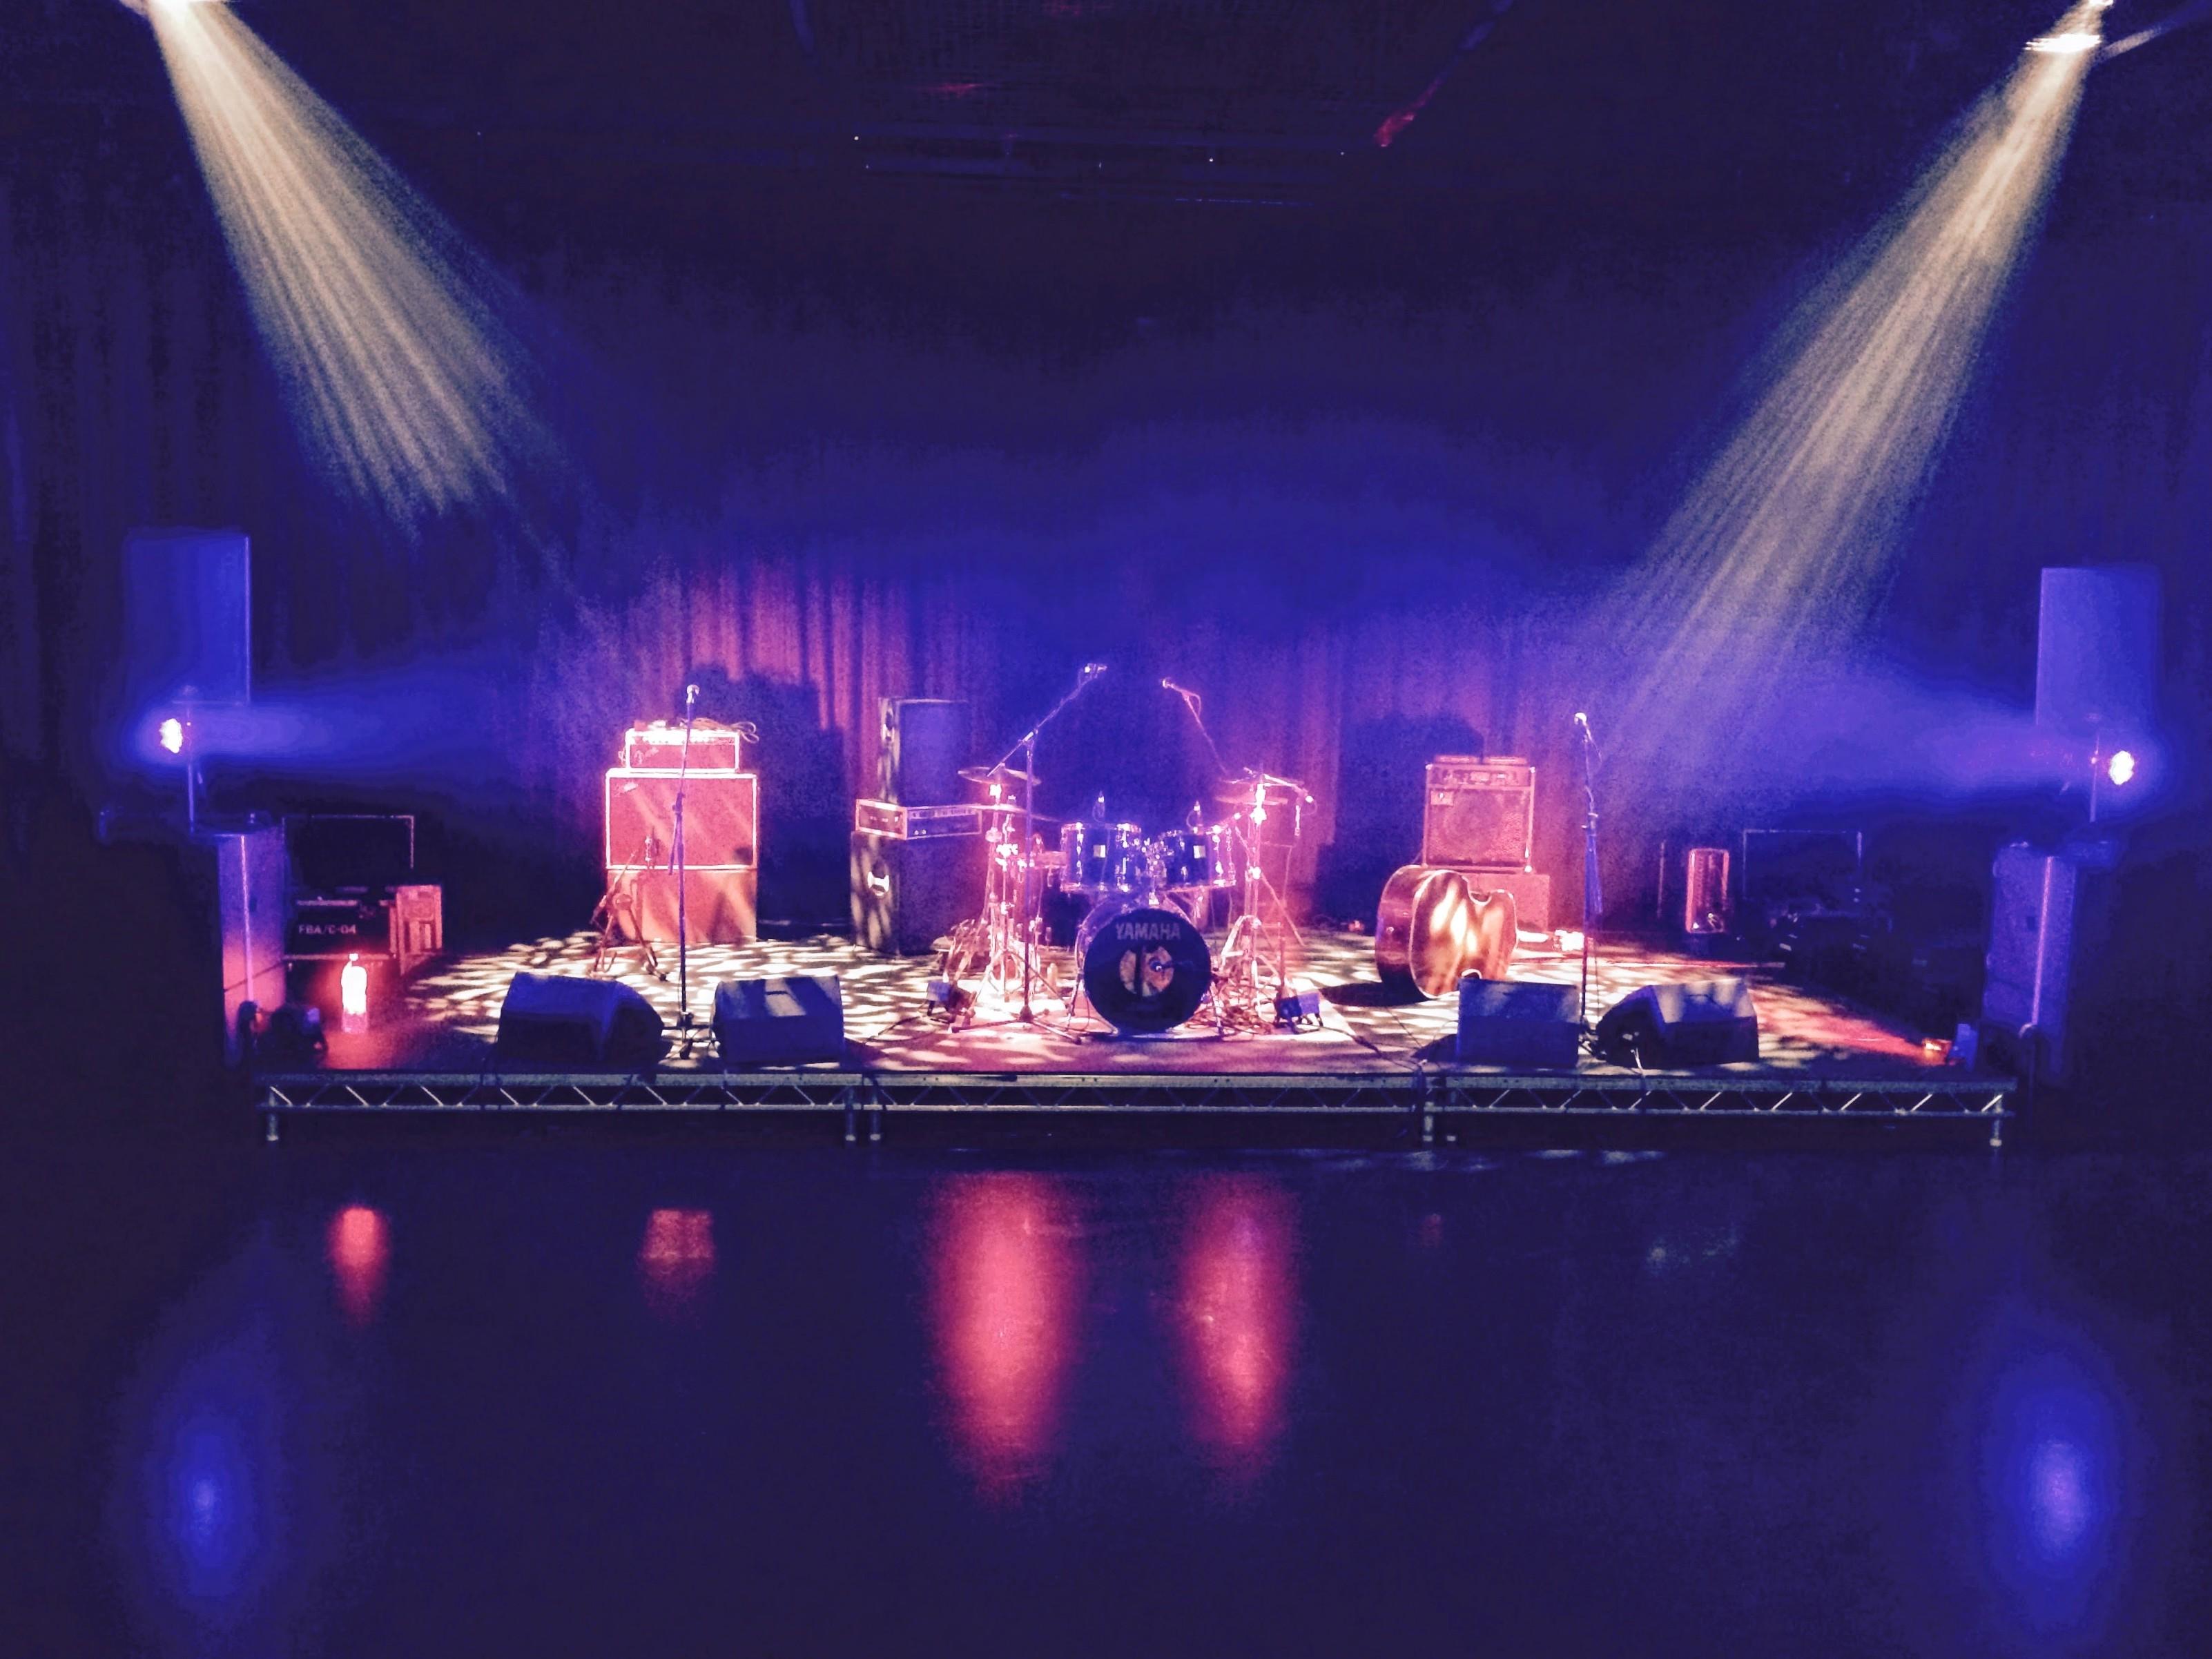 Houndogs stage